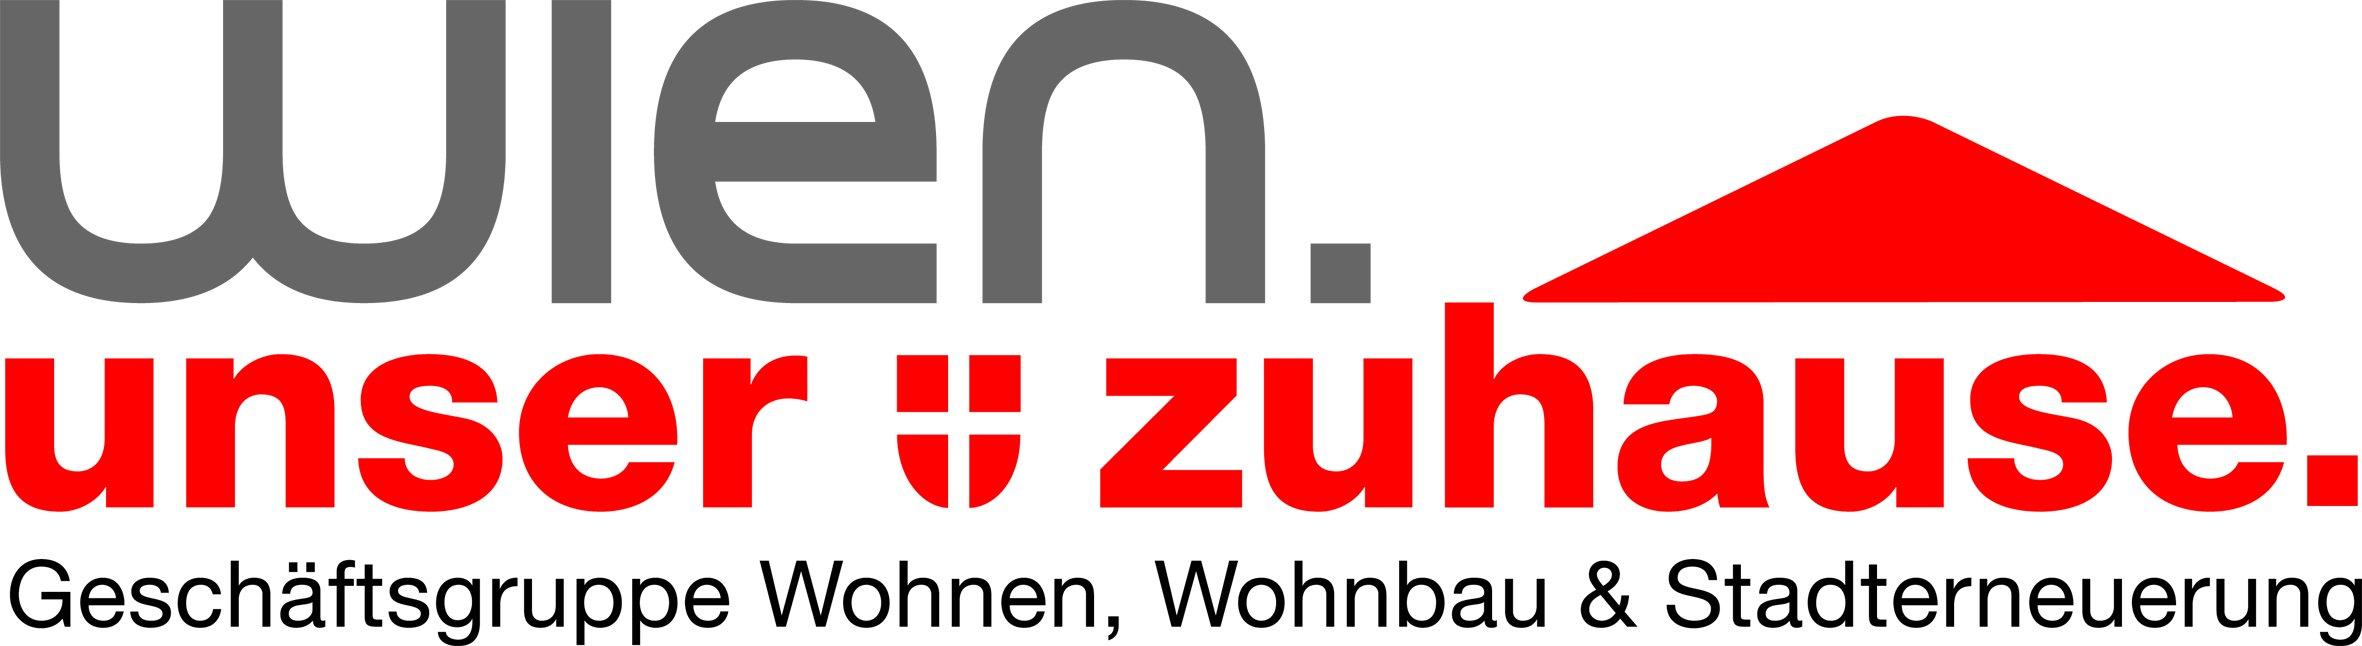 NEU_logo_dachmarke_2014.jpg